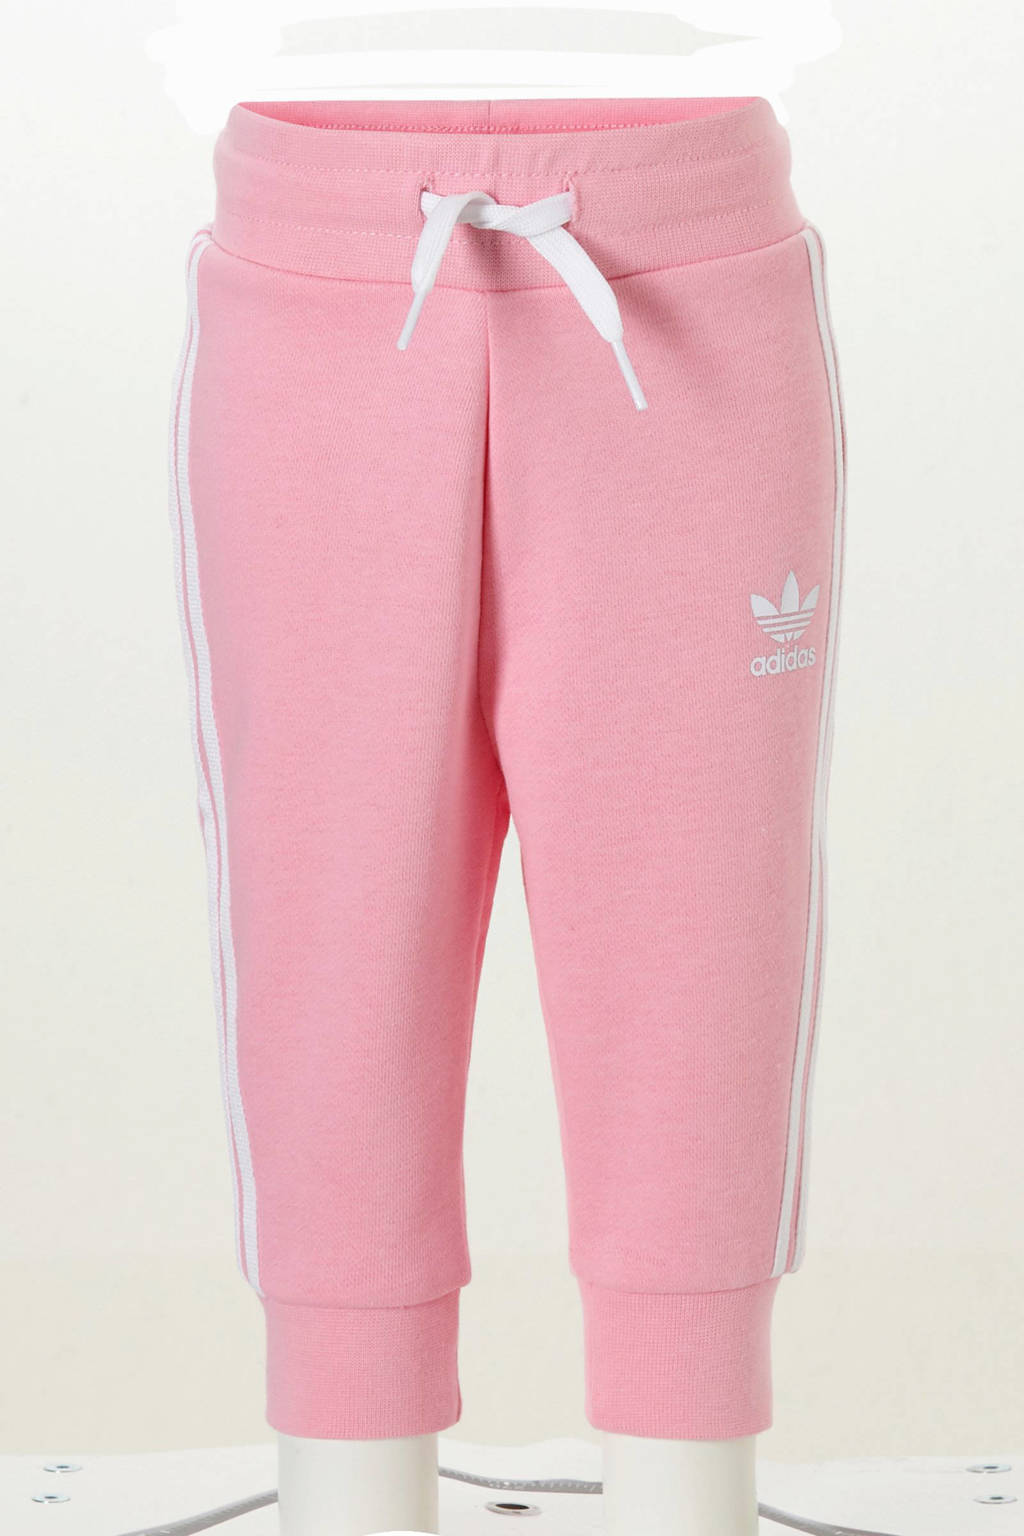 adidas originals trainingspak roze, Roze/wit